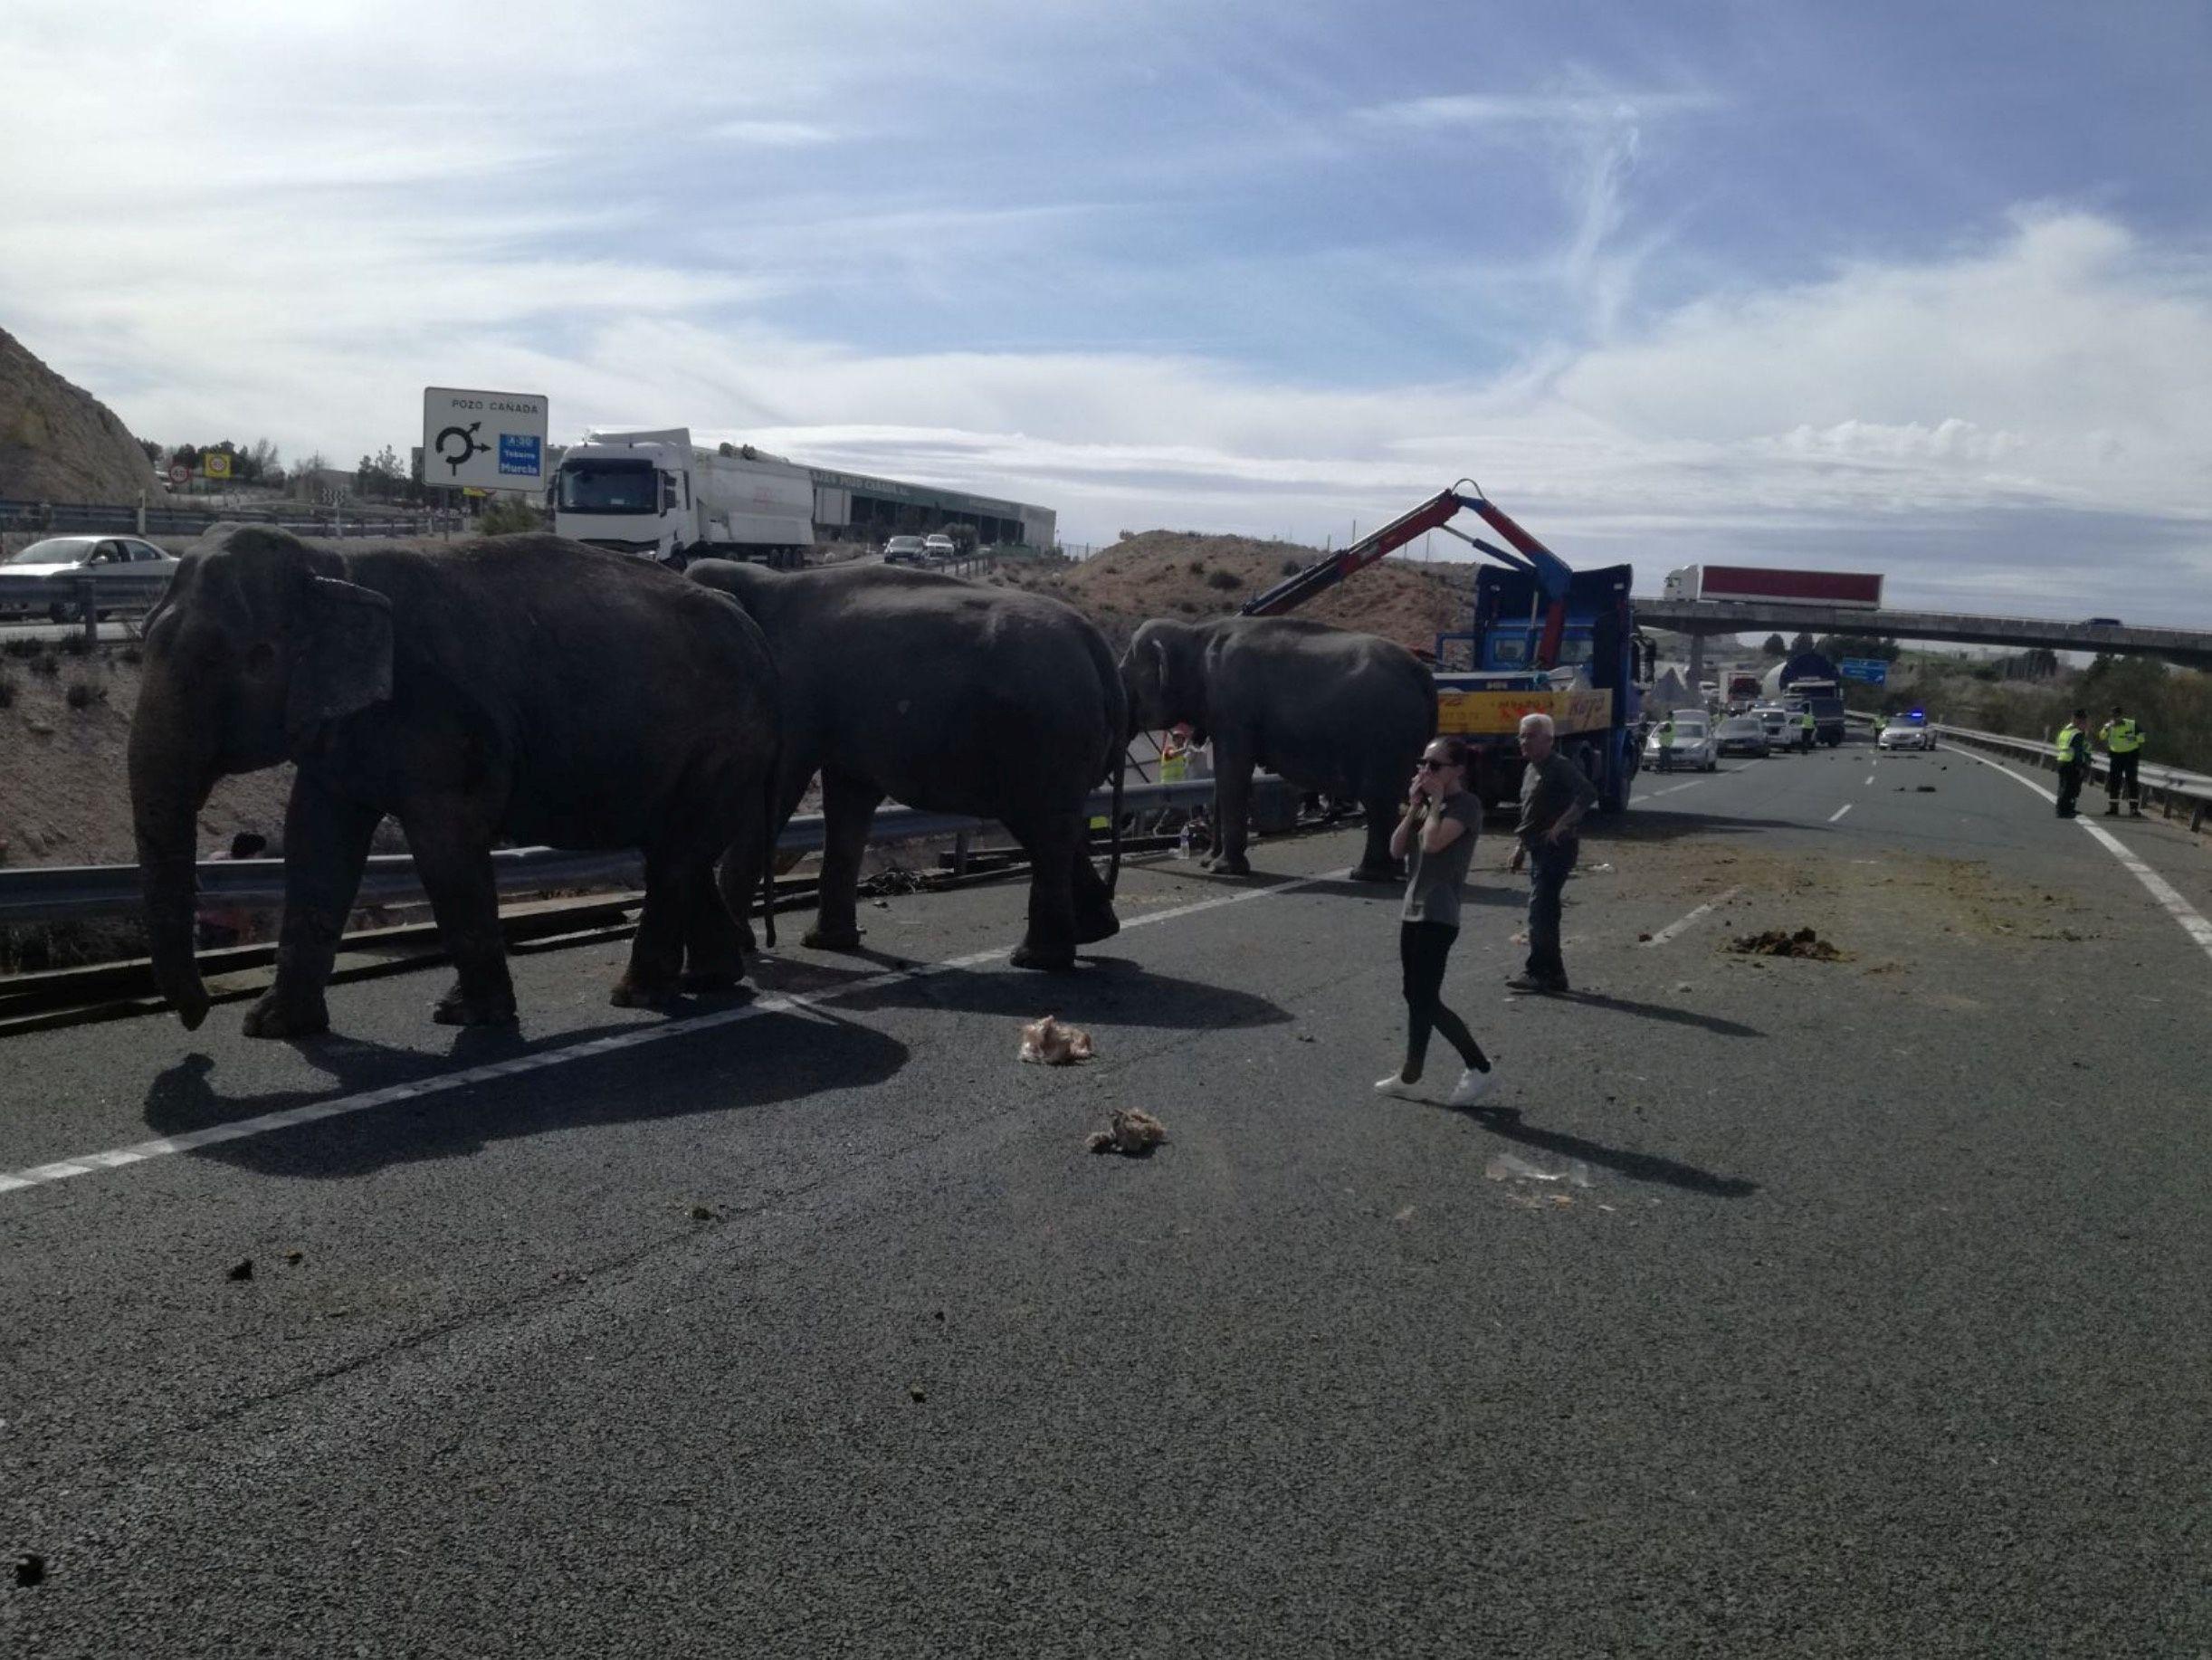 Elephants highway Spain